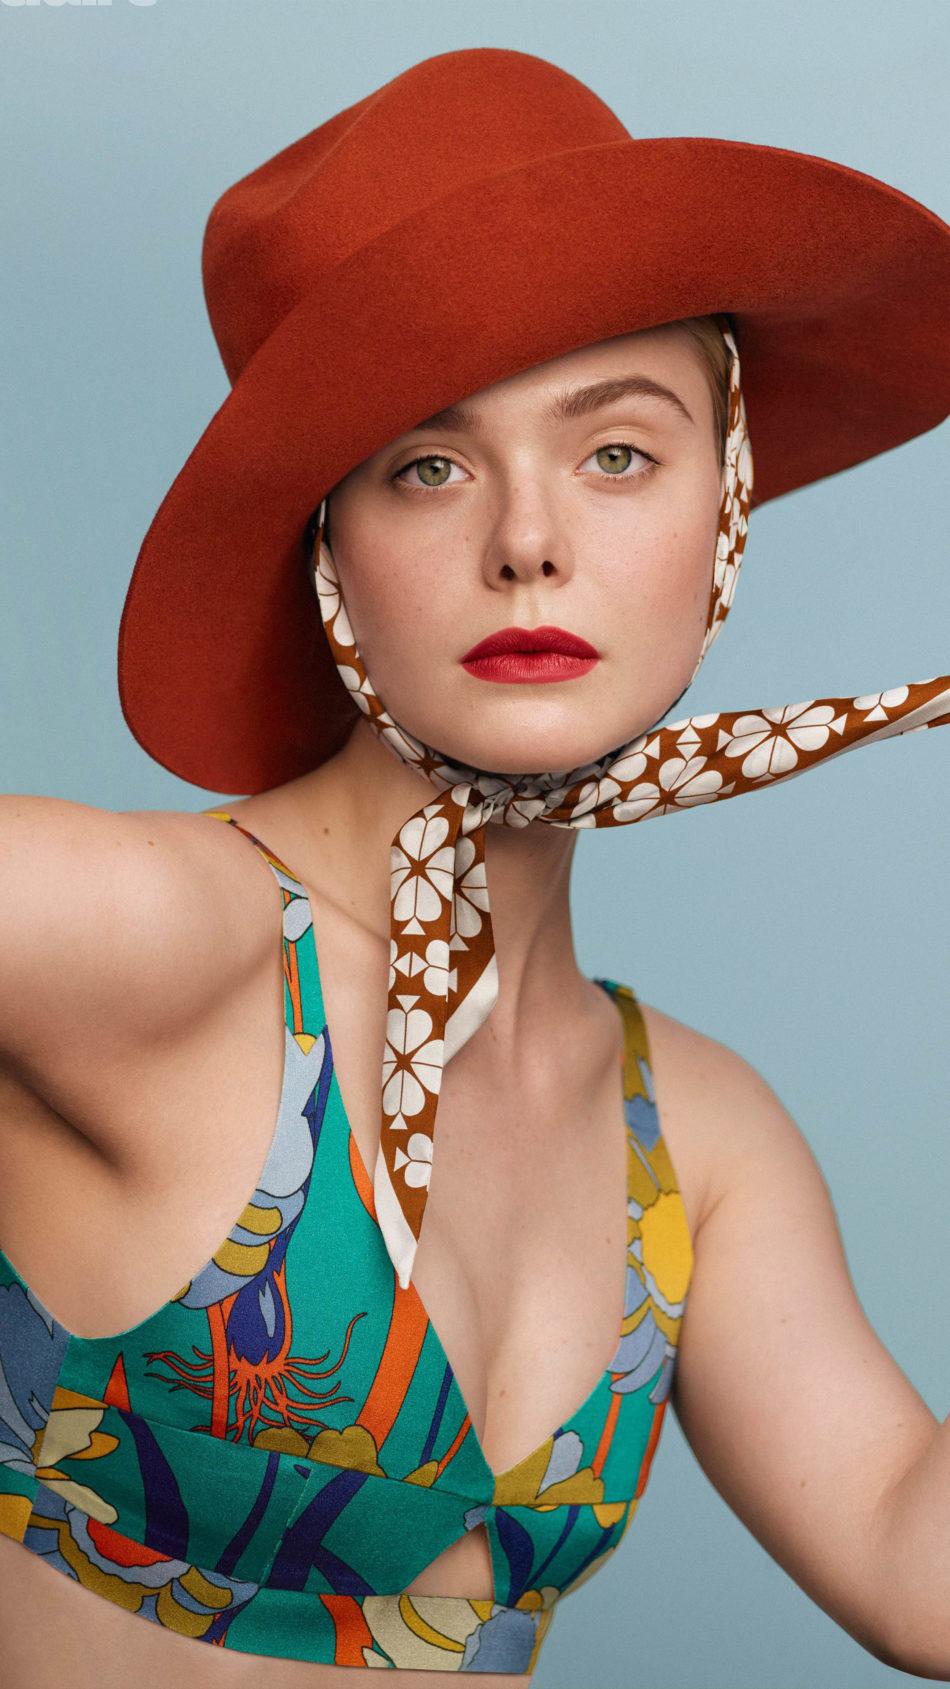 Elle Fanning Photoshoot Red Hat 4K Ultra HD Mobile Wallpaper